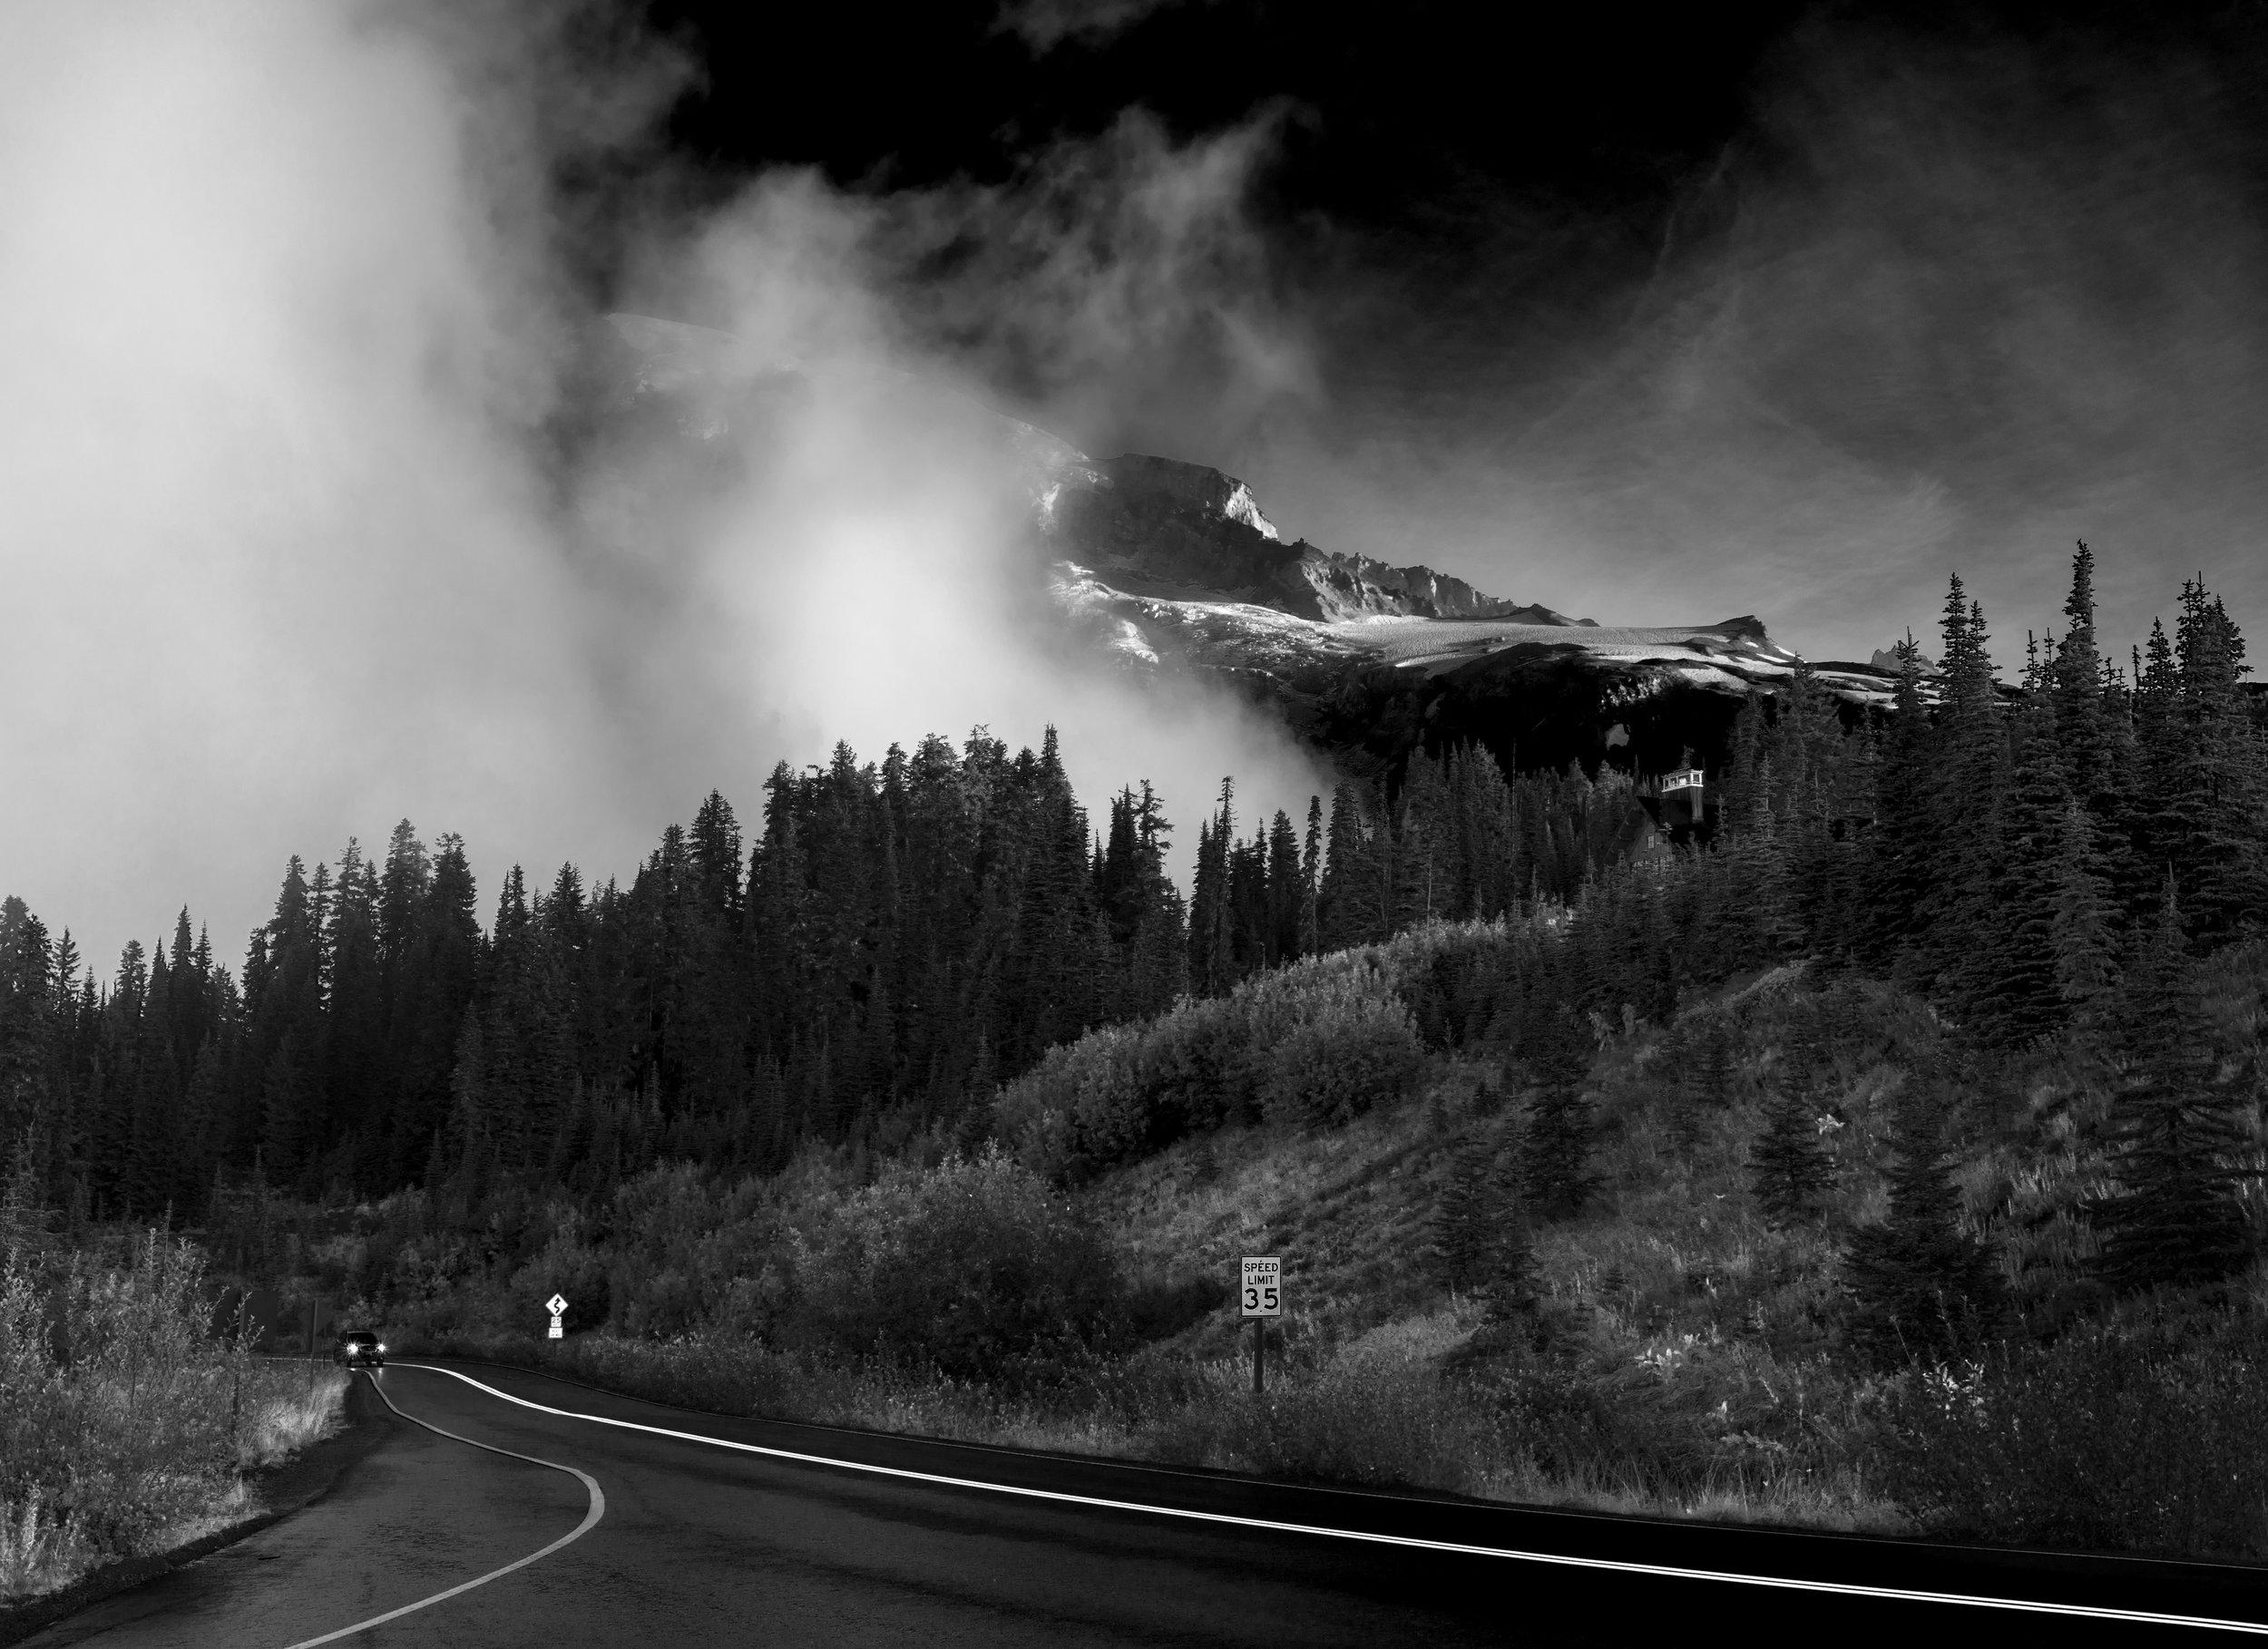 Copy of Mt. Rainer, Washington 2017